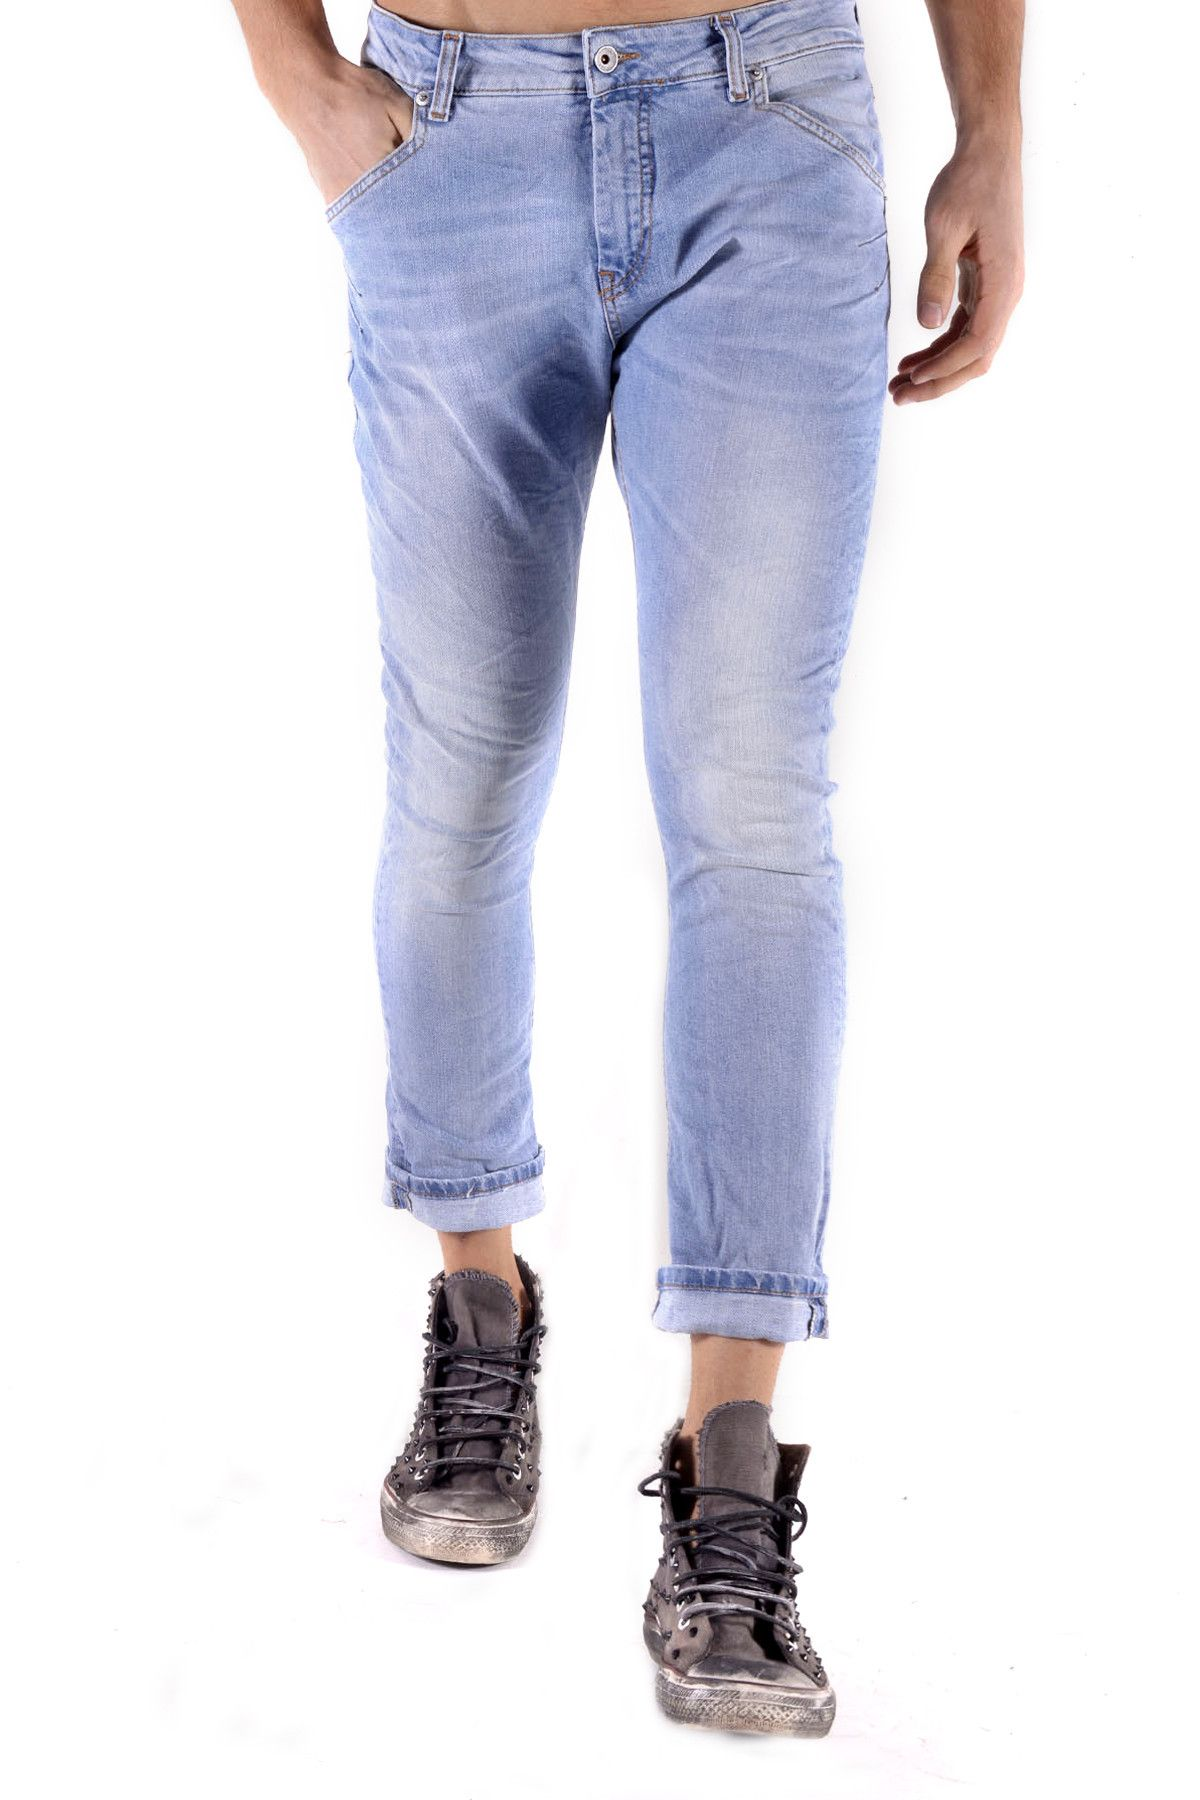 525 Men's Jeans In Light Blue